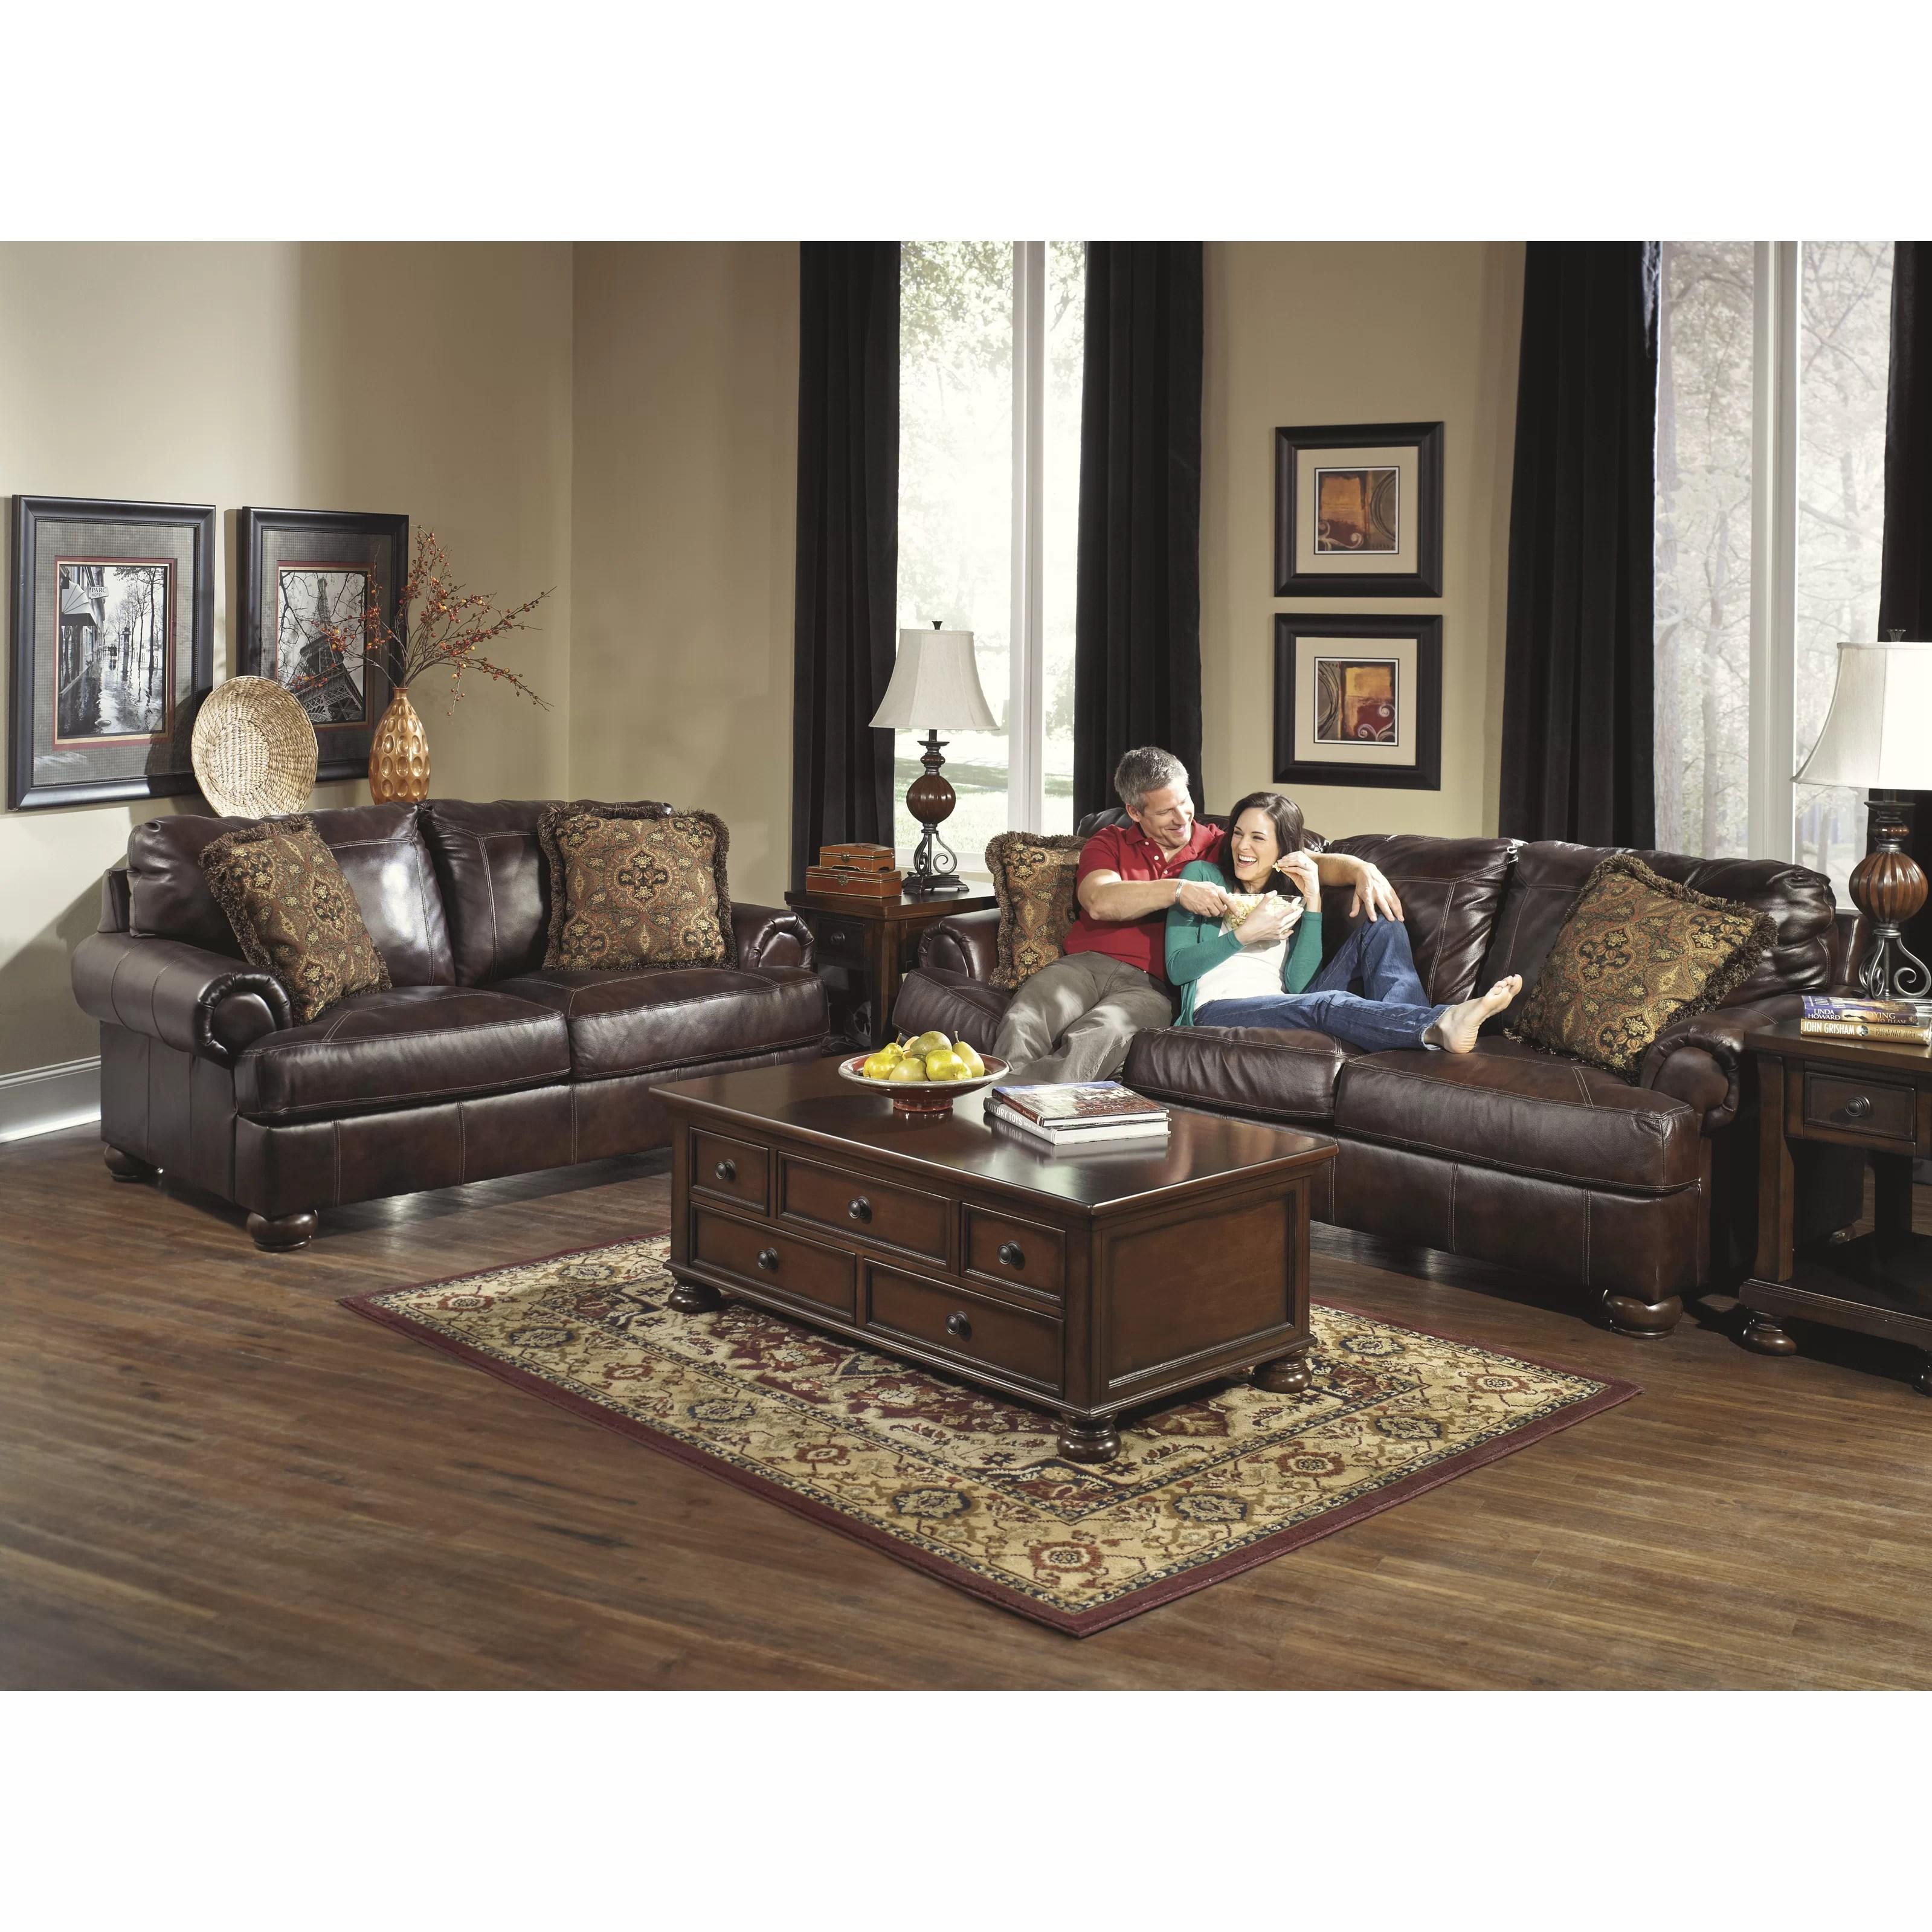 signature design by ashley harvest sleeper sofa small fabric sofas uk heath leather wayfair